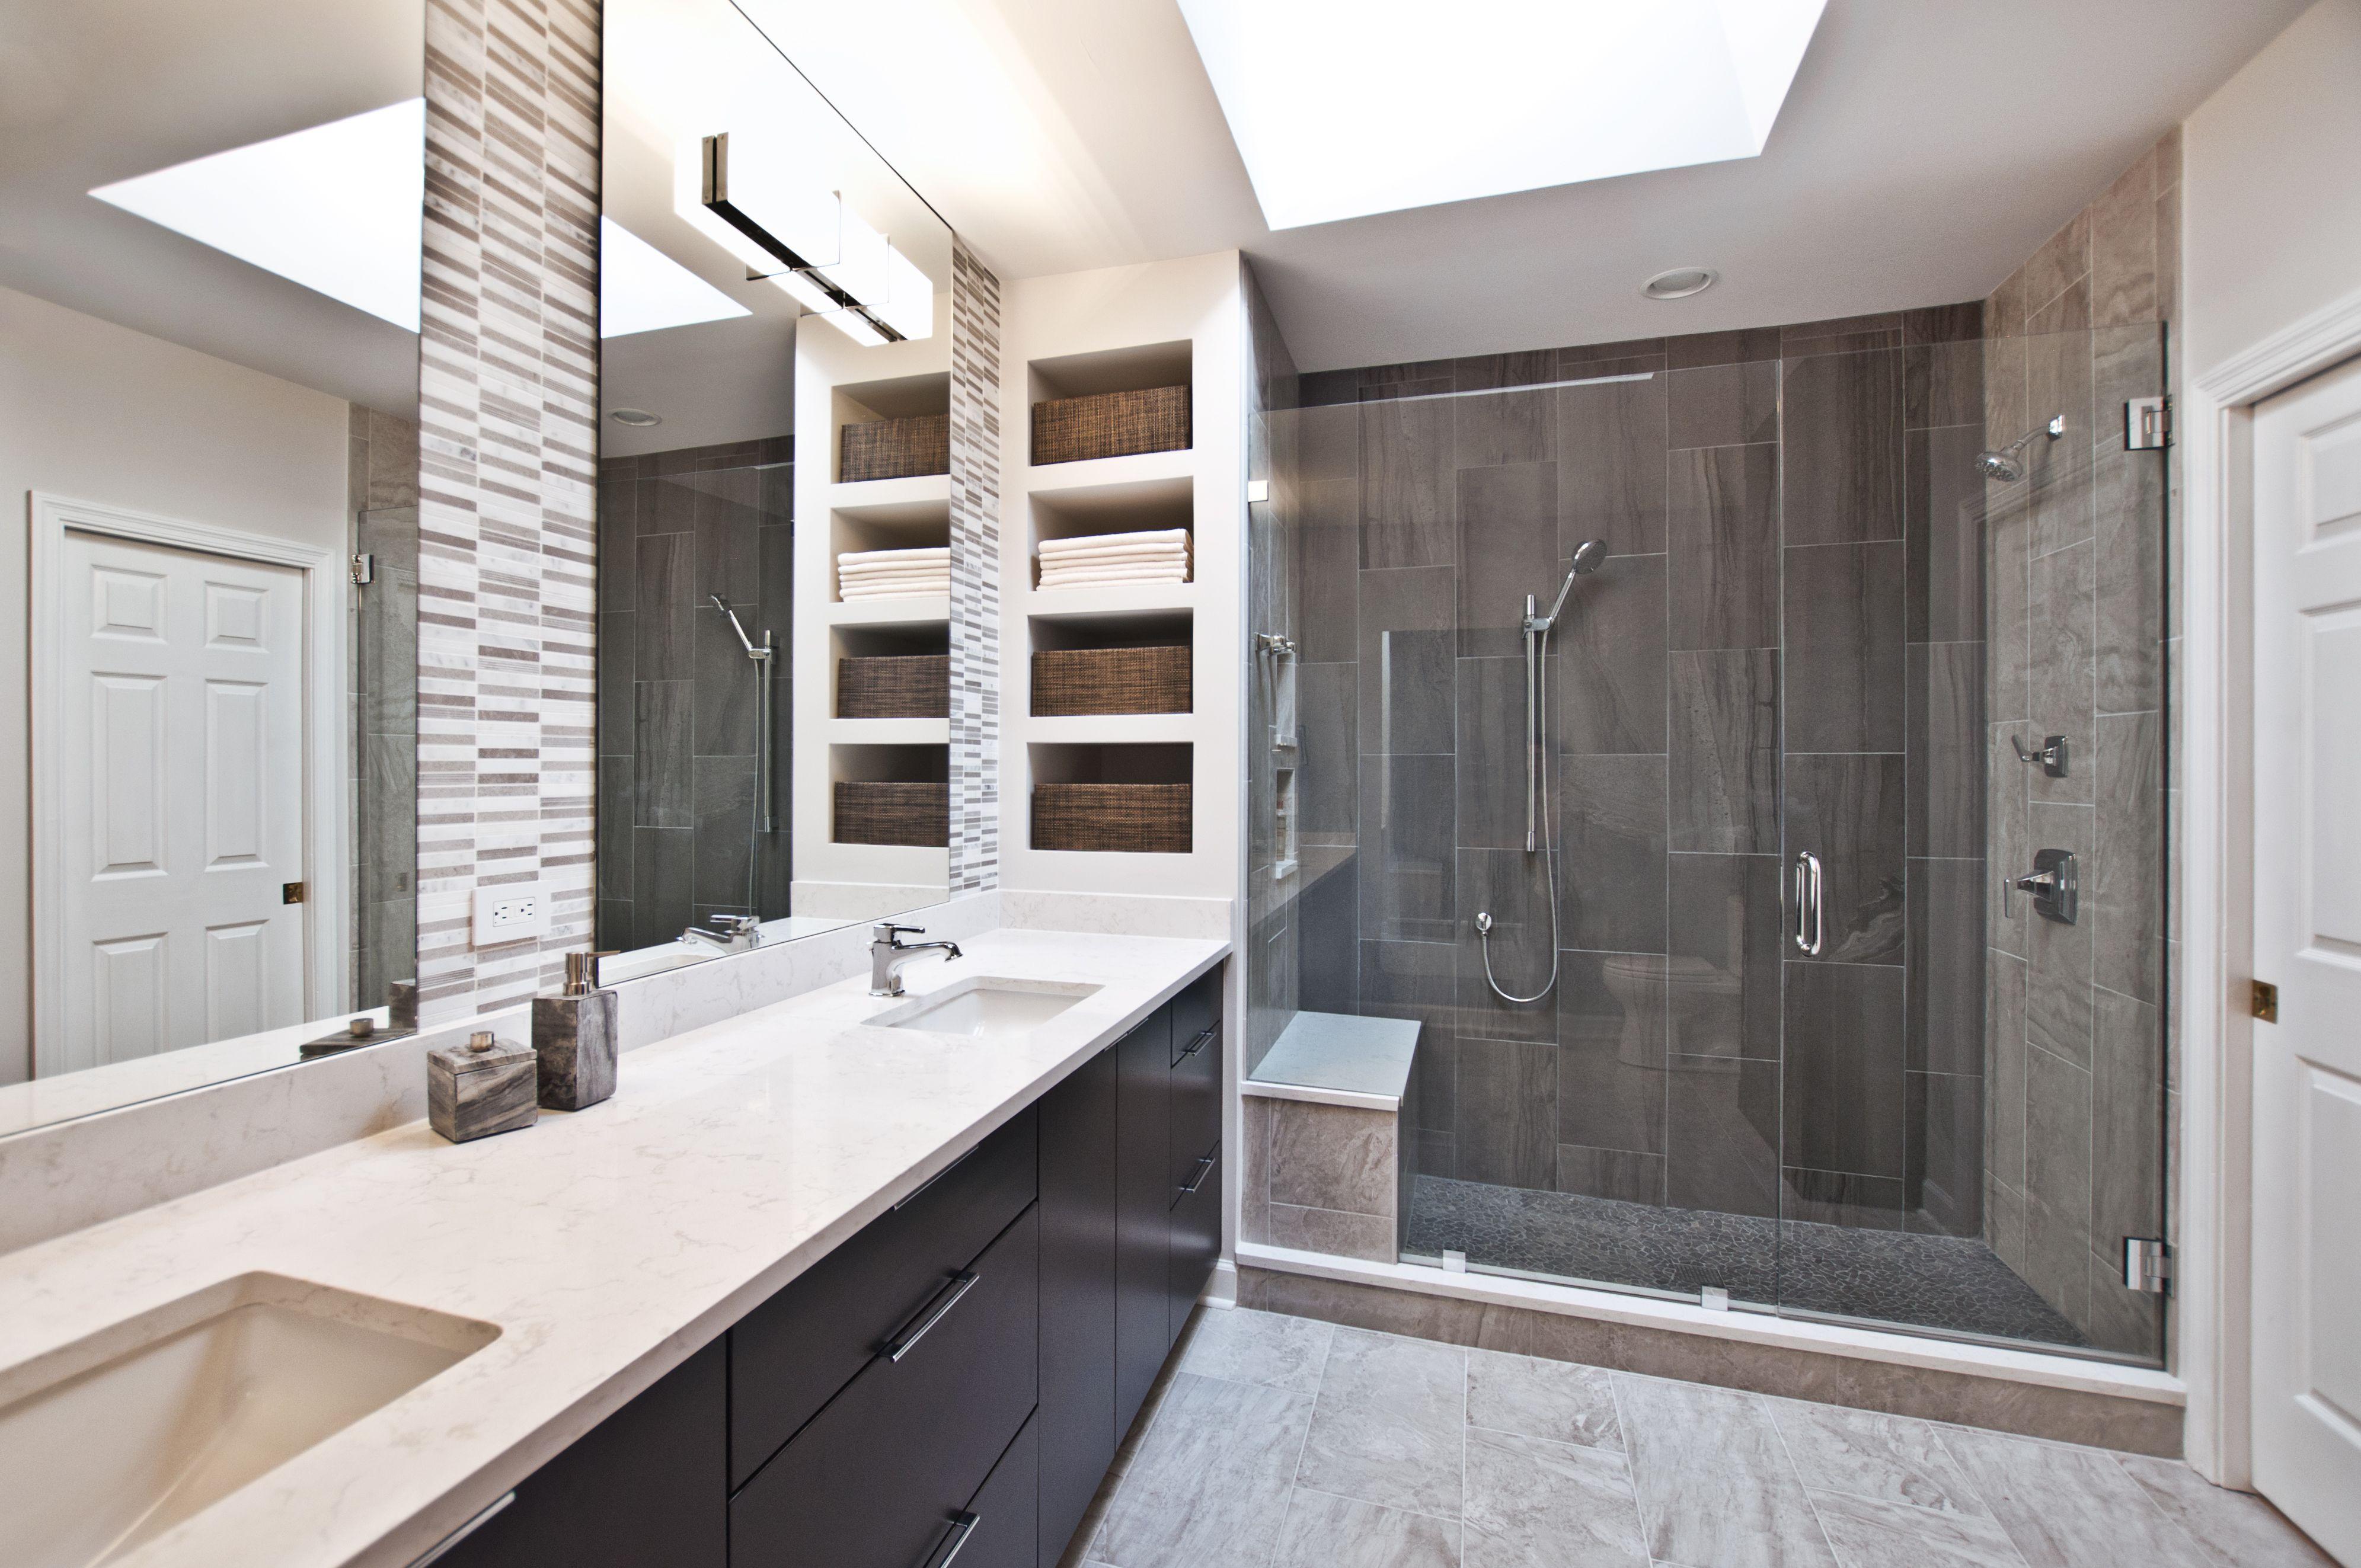 Pretty in porcelain bathroom remodel nashville tn - Designer baths and kitchens germantown tn ...